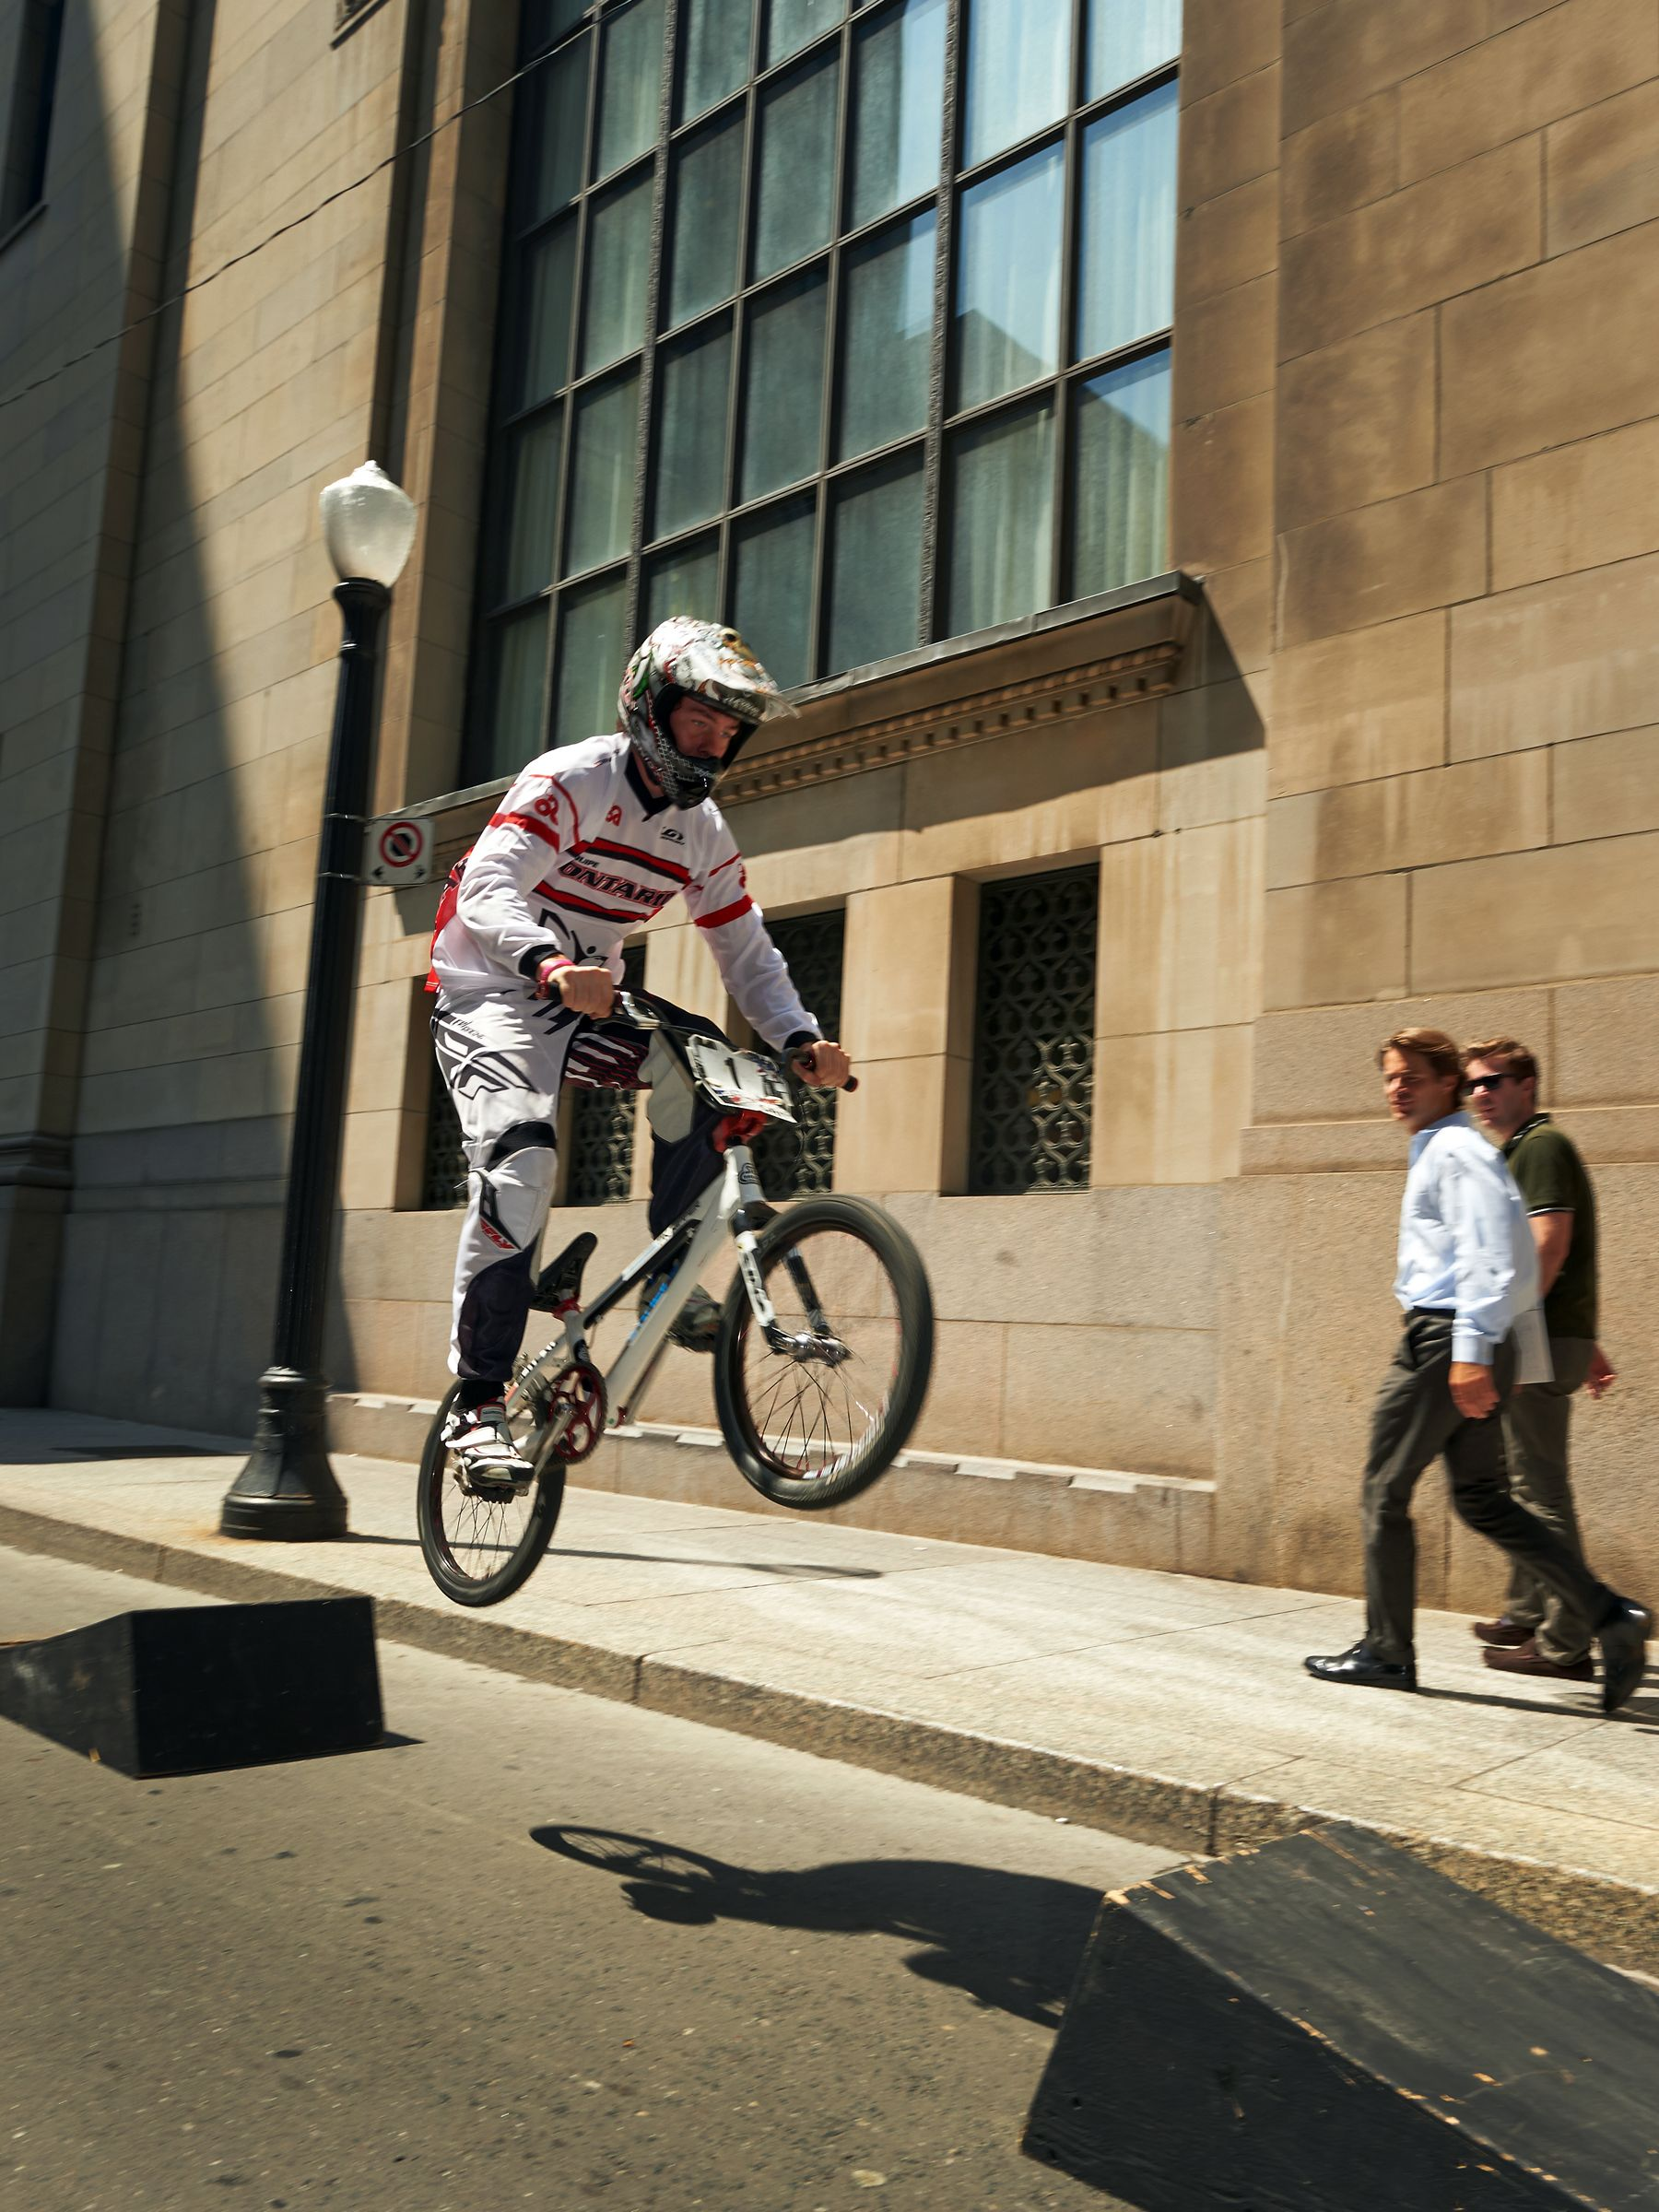 BMX-UCI-rider-Alex-Wright-Commerce-Court-Toronto.jpg